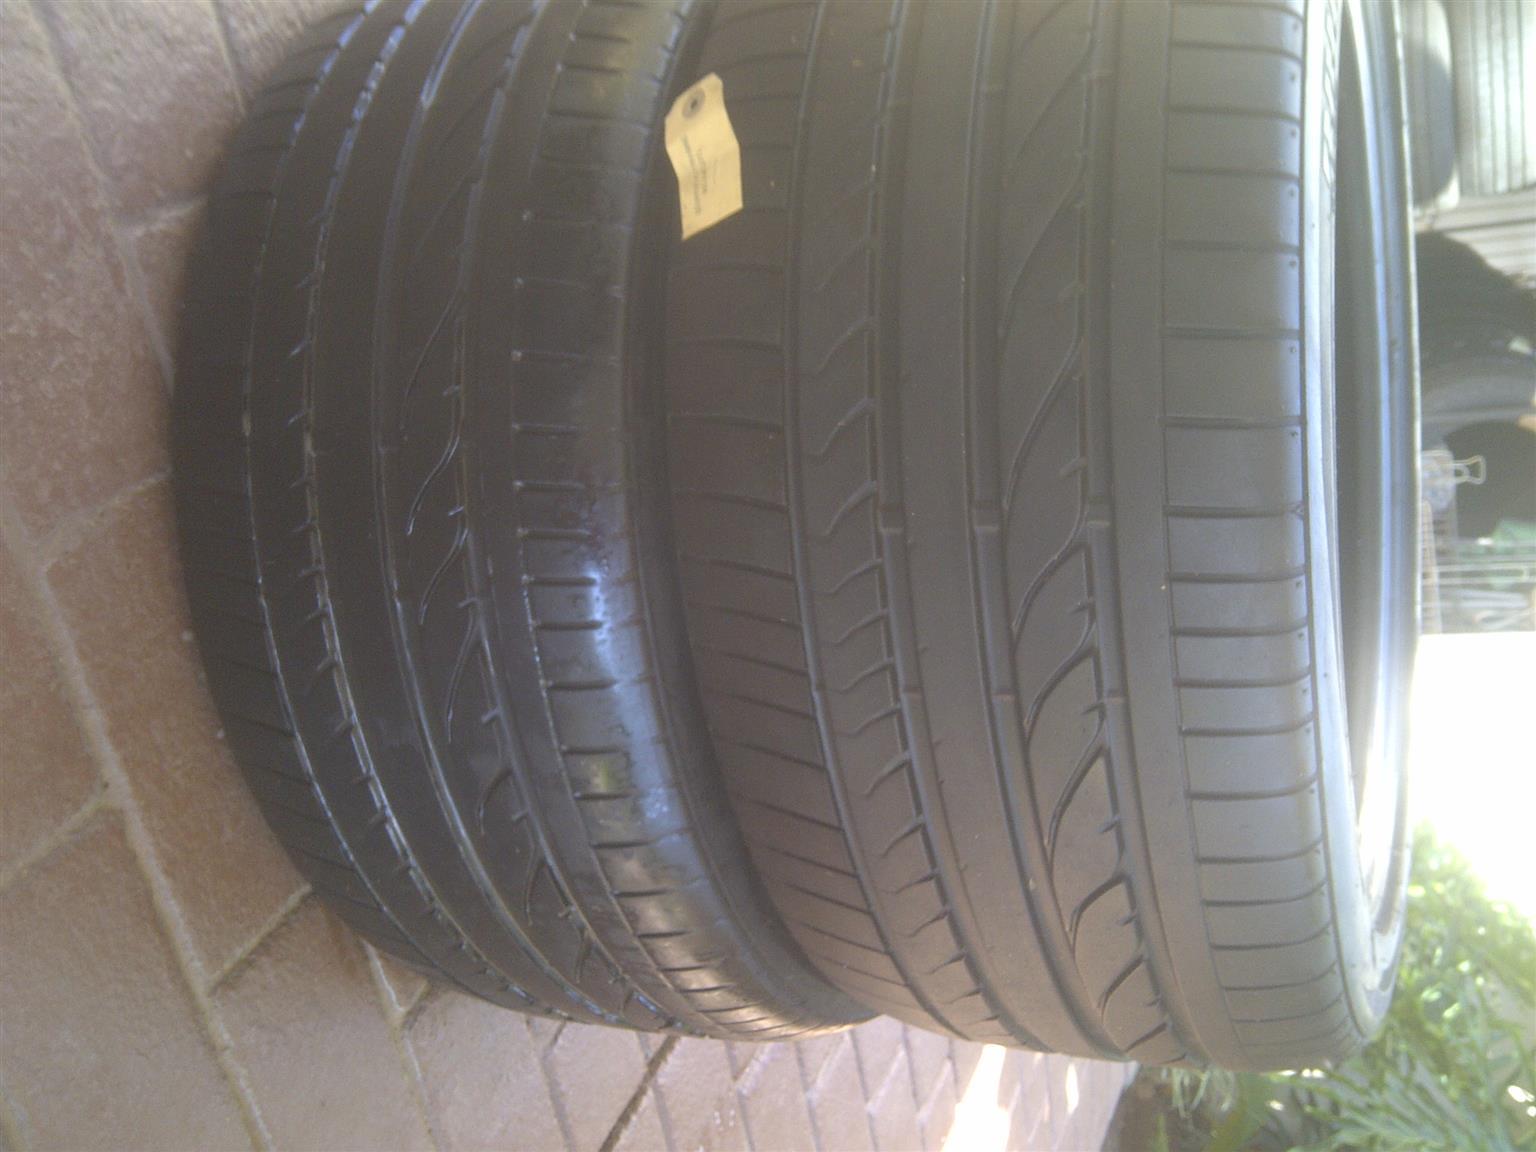 2xBMW X5 front tyres Bridgestone Dueler 275/40/20,close to 80% thread